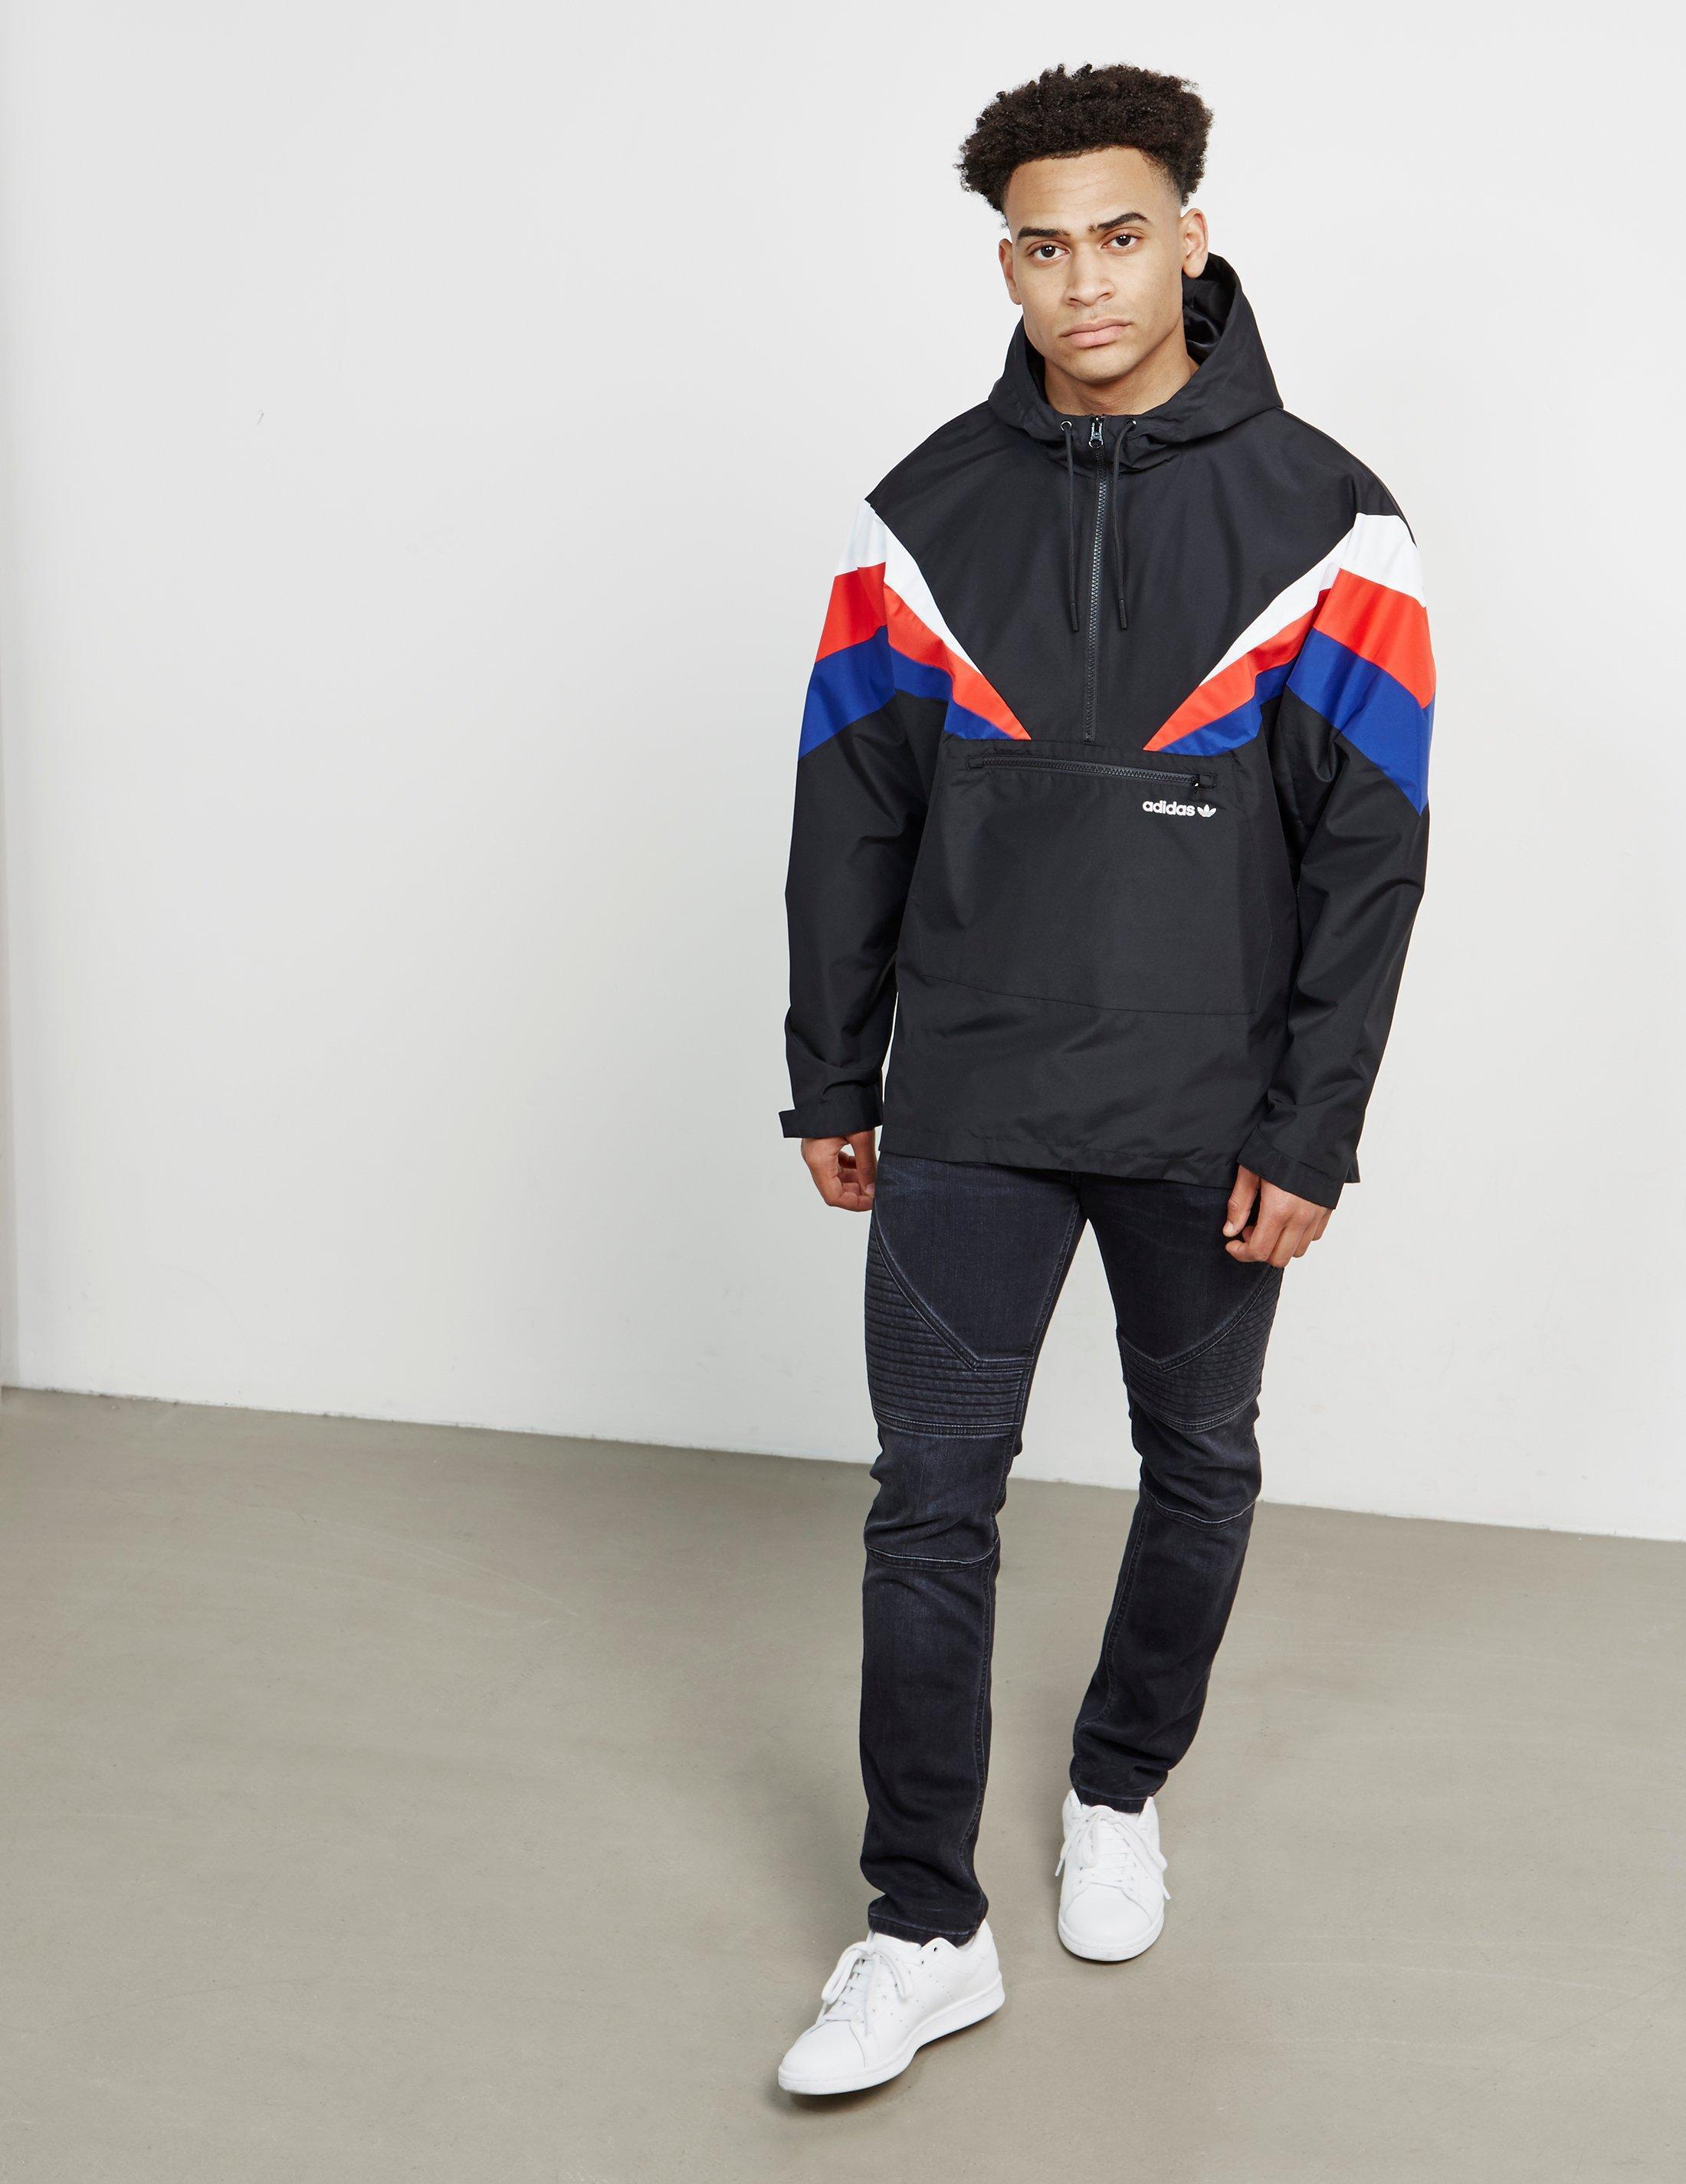 adidas original hoodie men black red whte